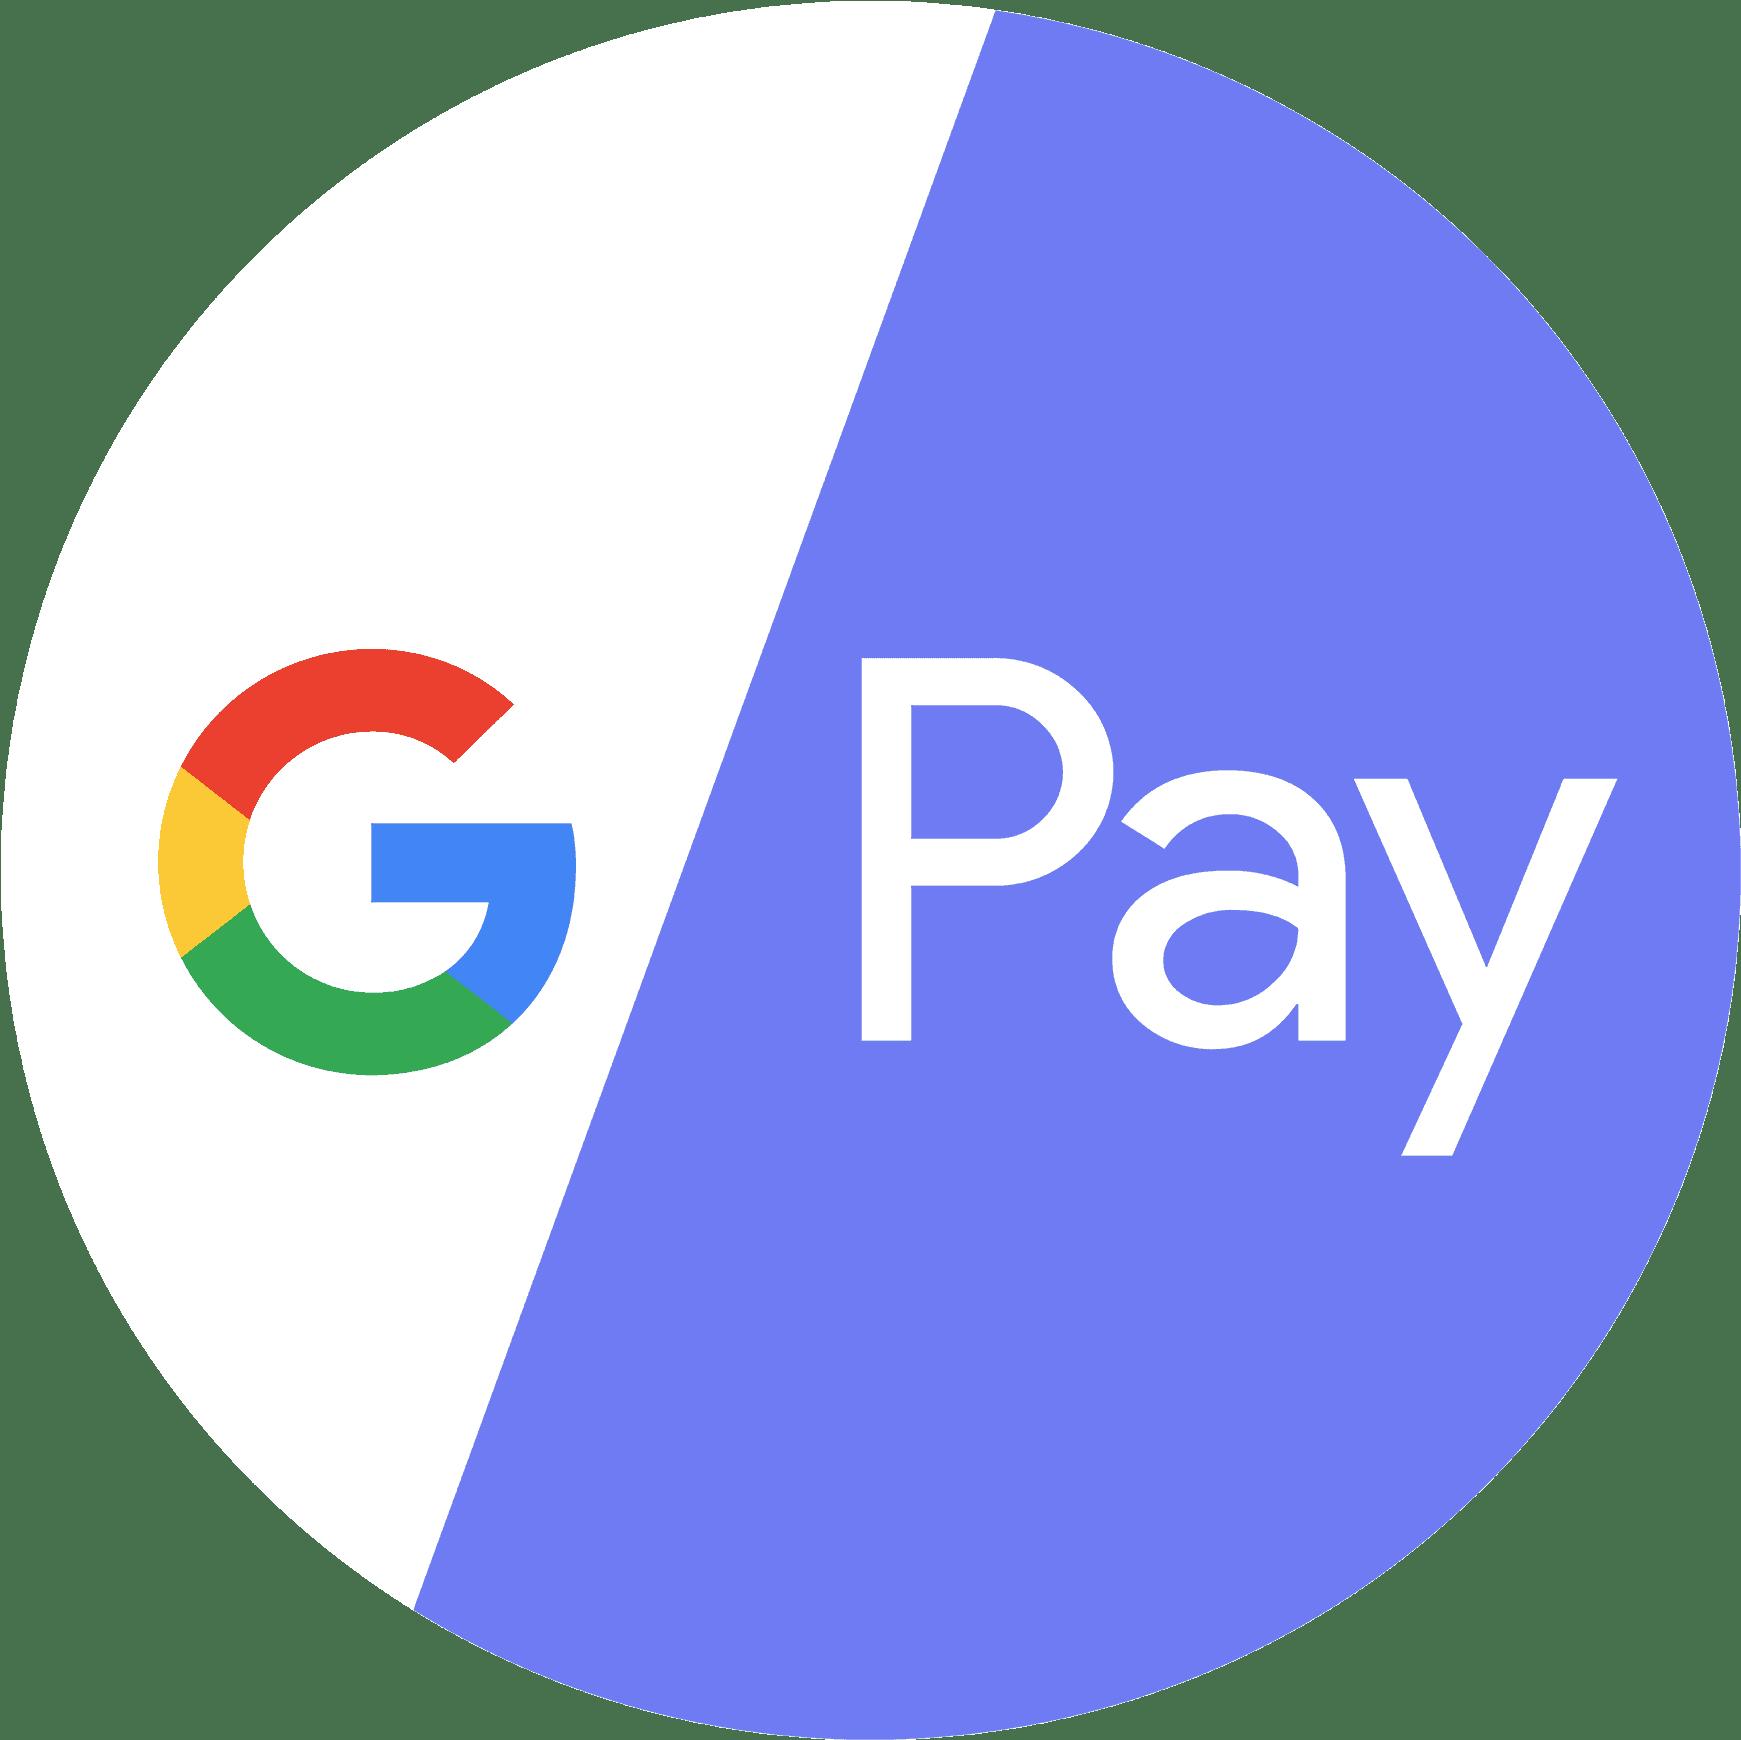 google pay logo png, google pay png logo, google pay logo png hd, google pay transparent, google pay image png, google pay png icon, google pay hd logo